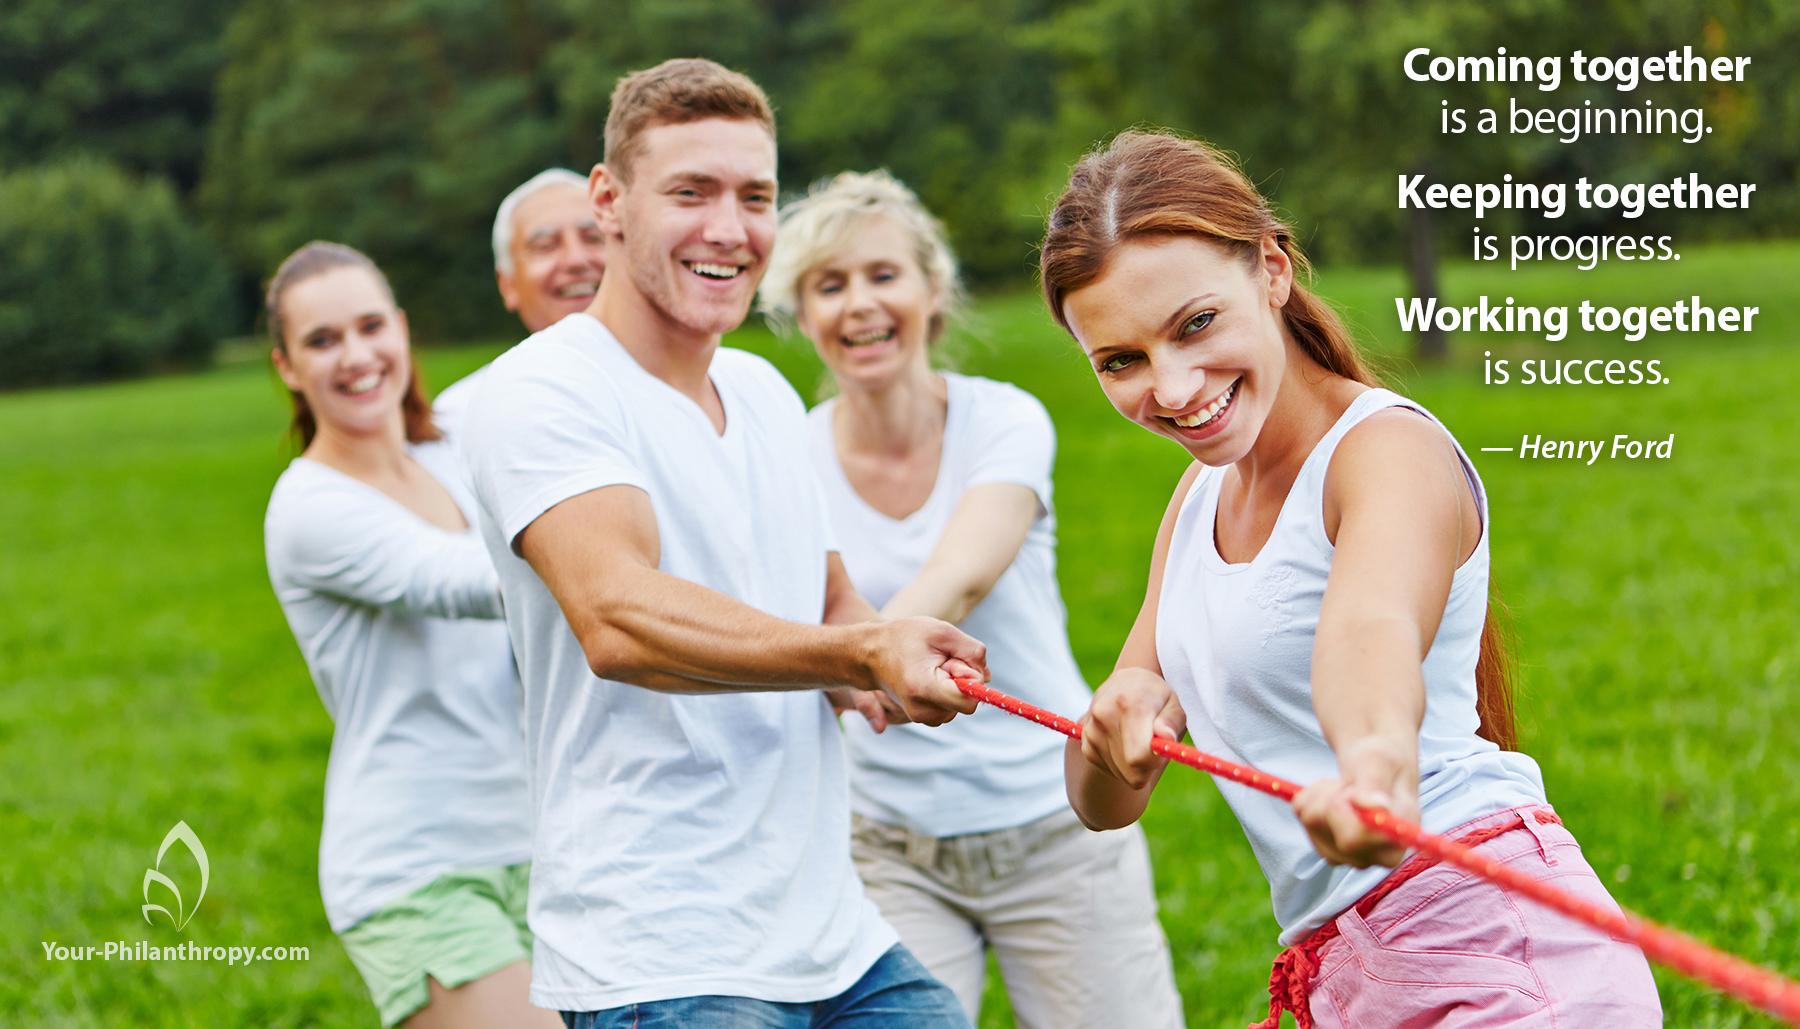 5 Keys To Build Teamwork In Family Giving